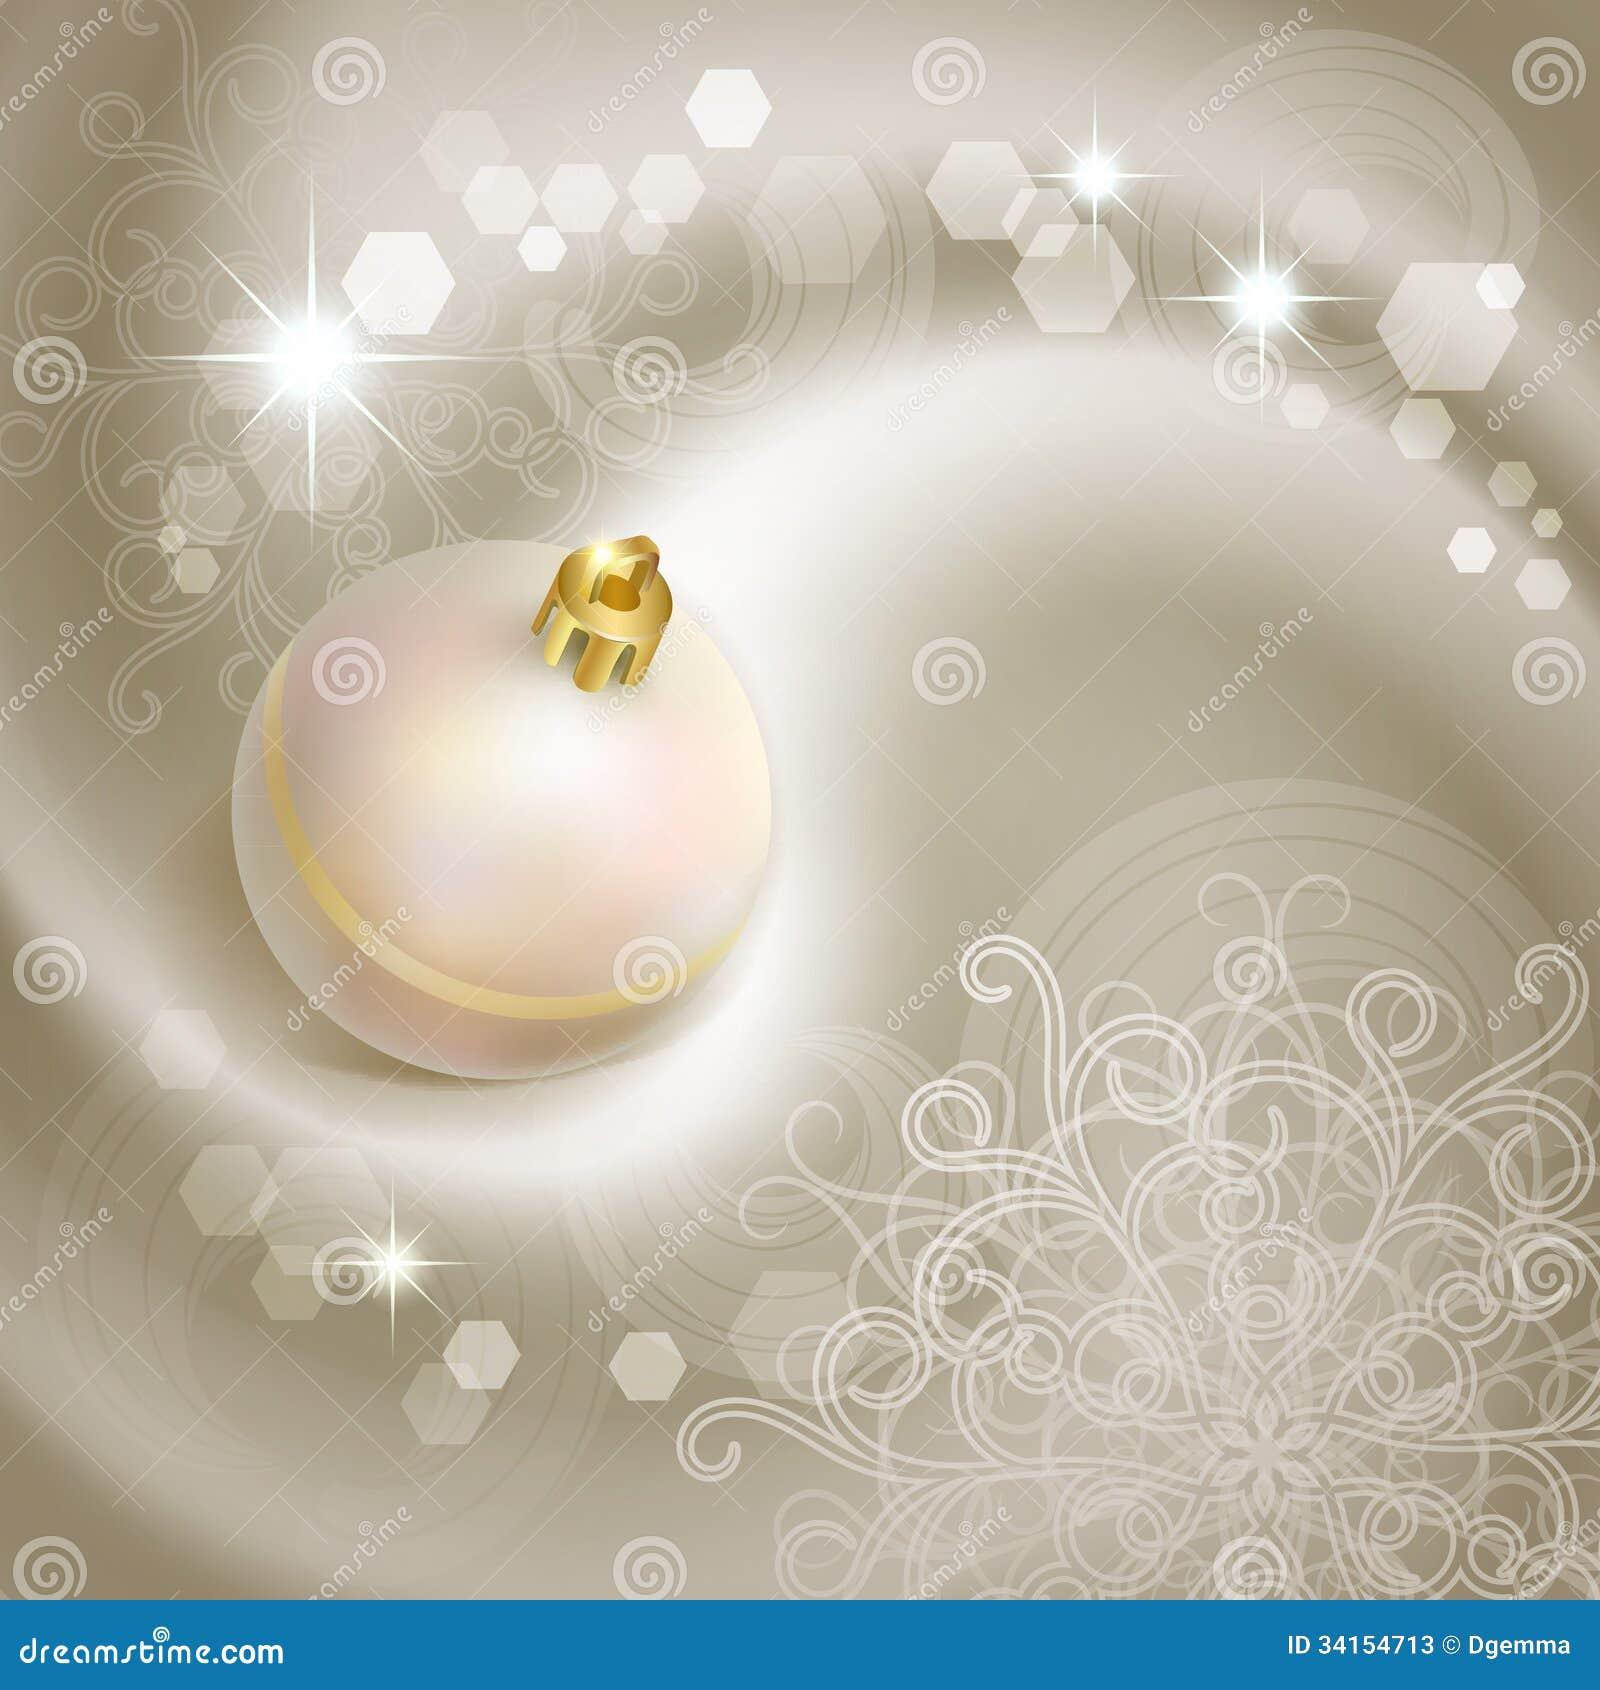 Elegant christmas tree decor - Christmas Background Stock Photos Image 34154713